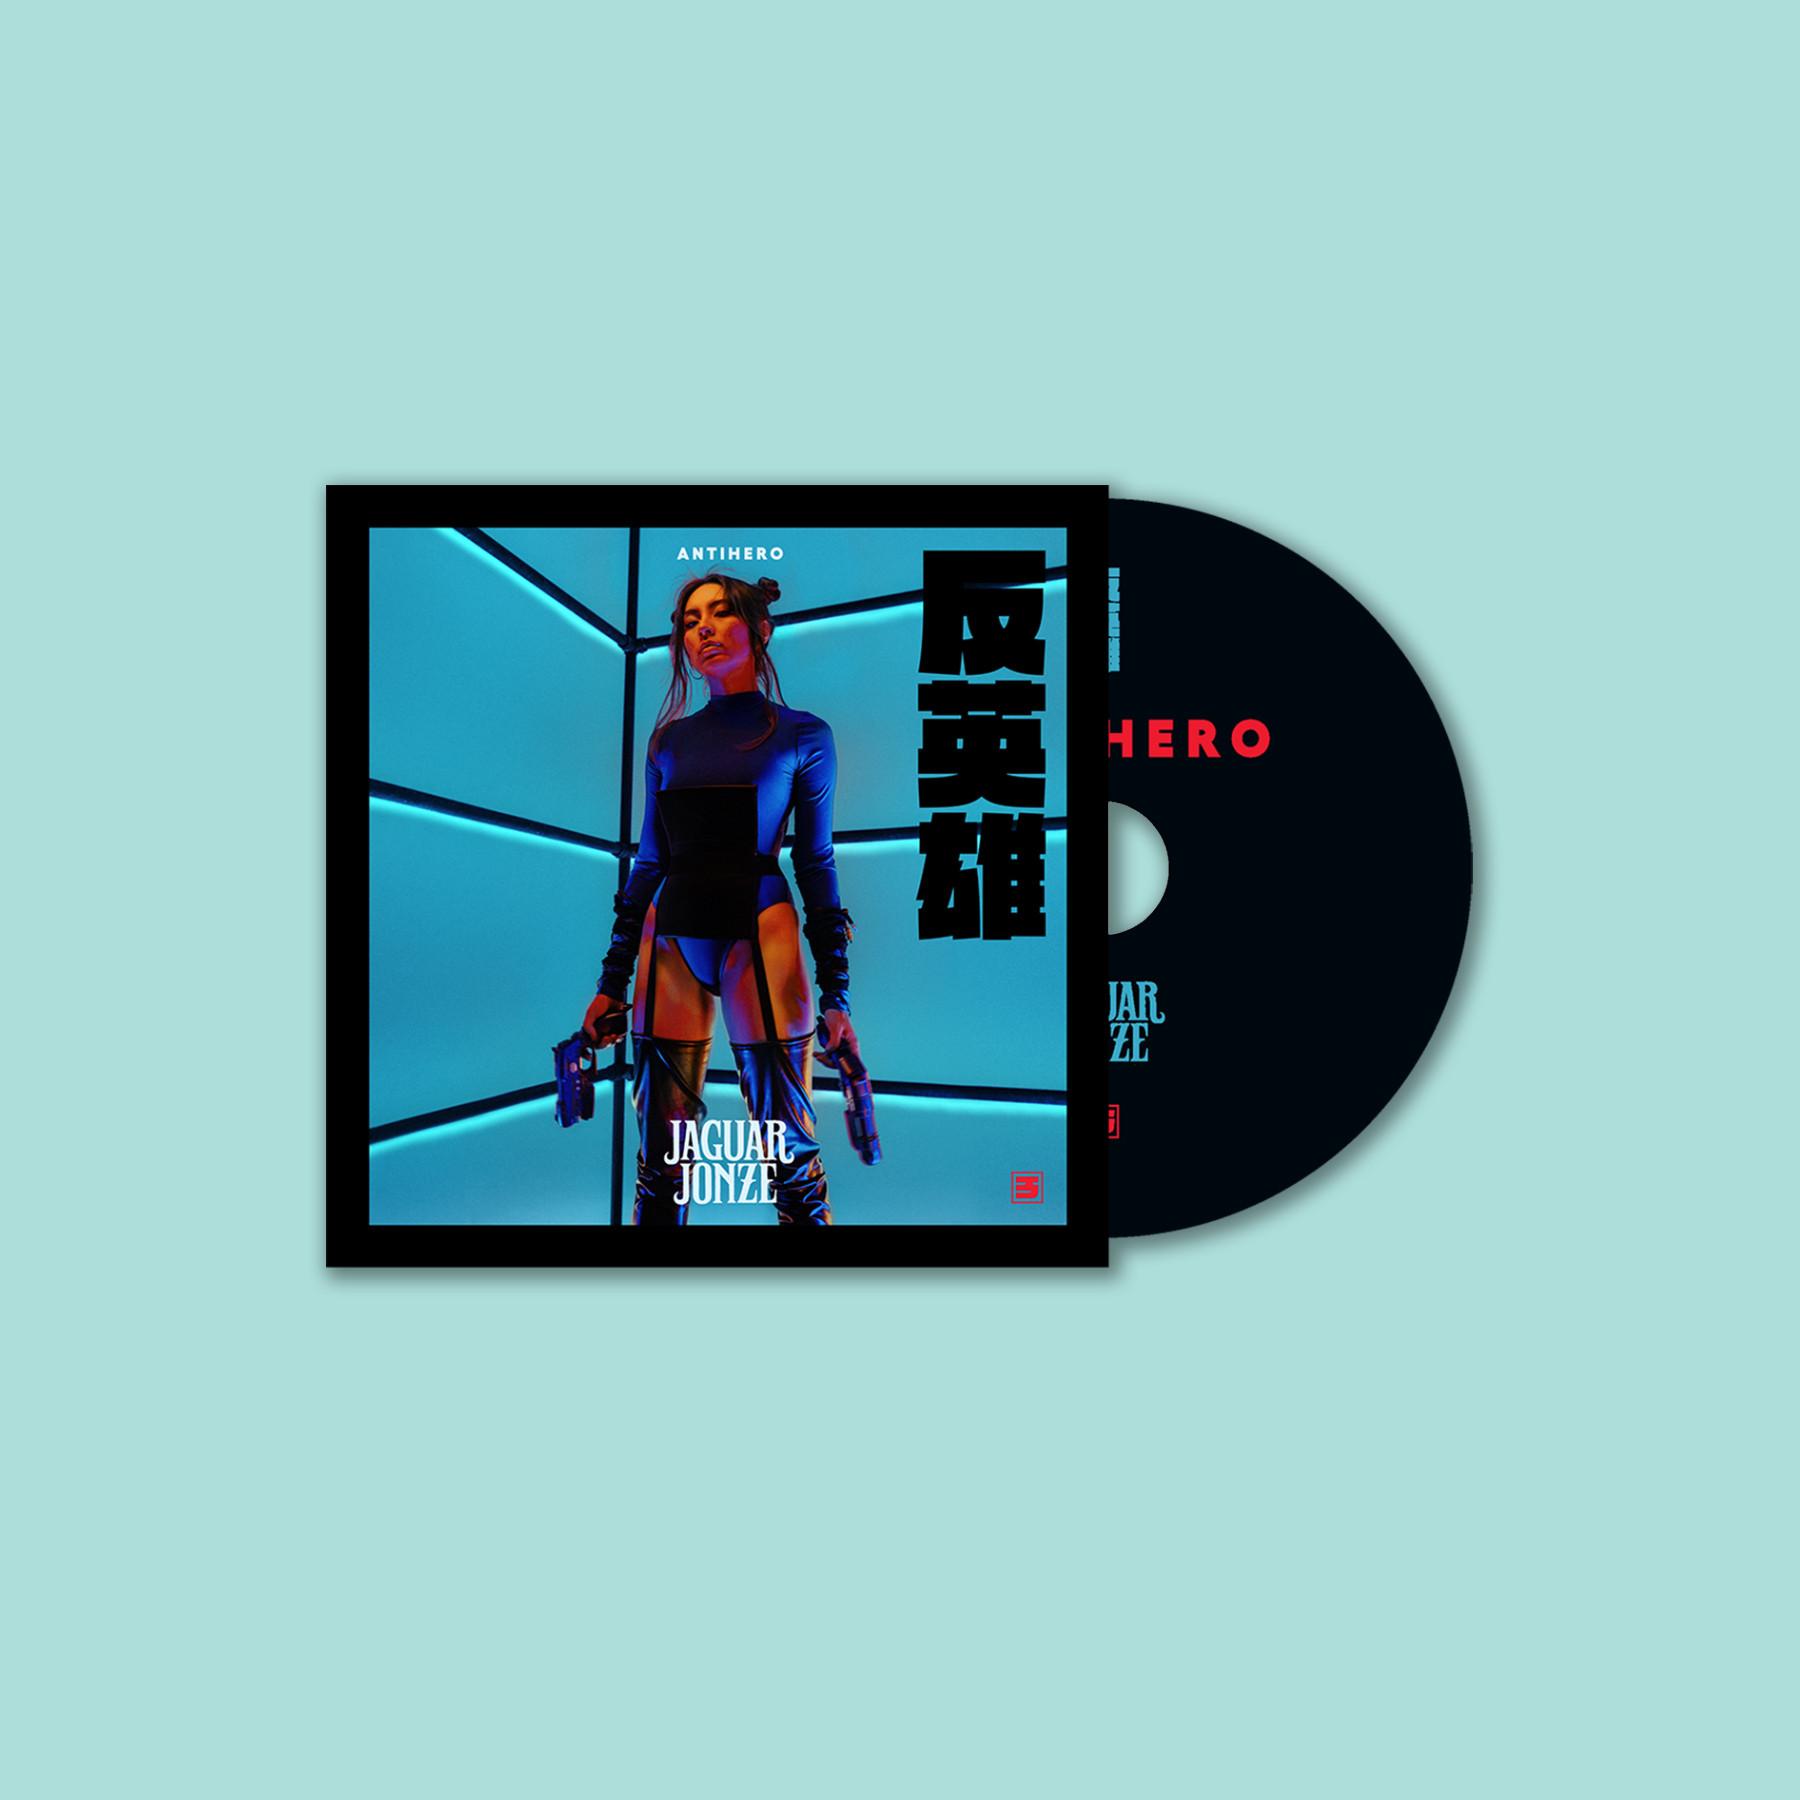 ANTIHERO CD